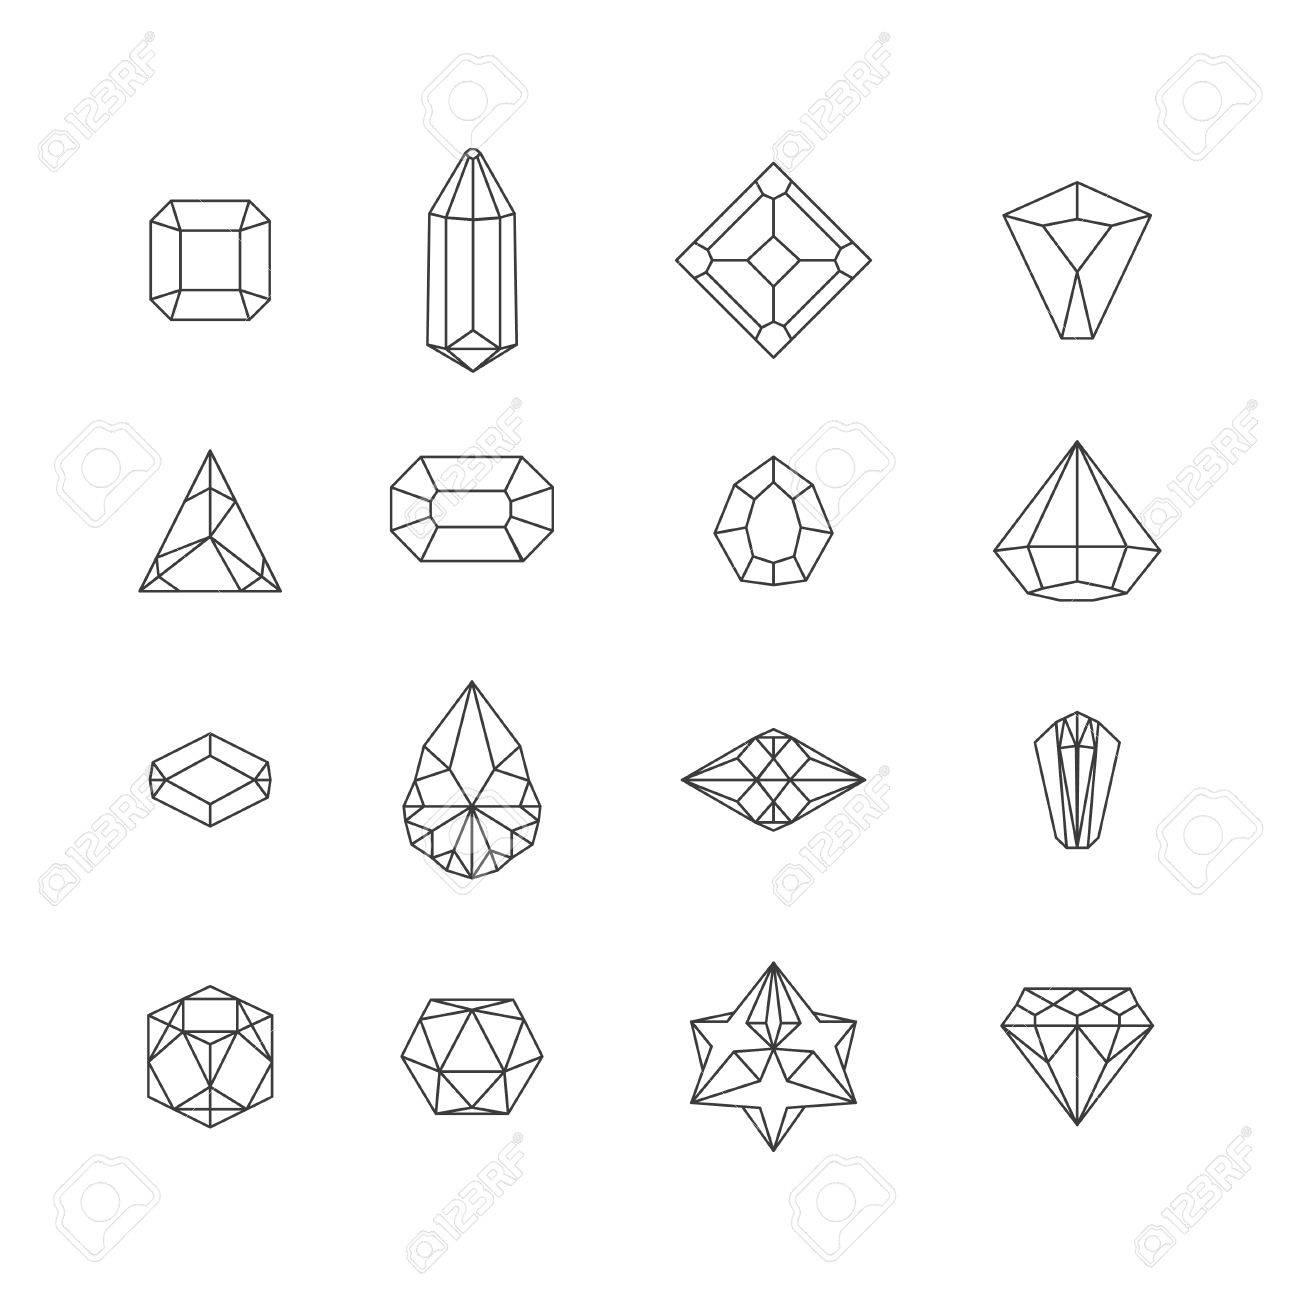 vector illustration of crystal icons for design website background